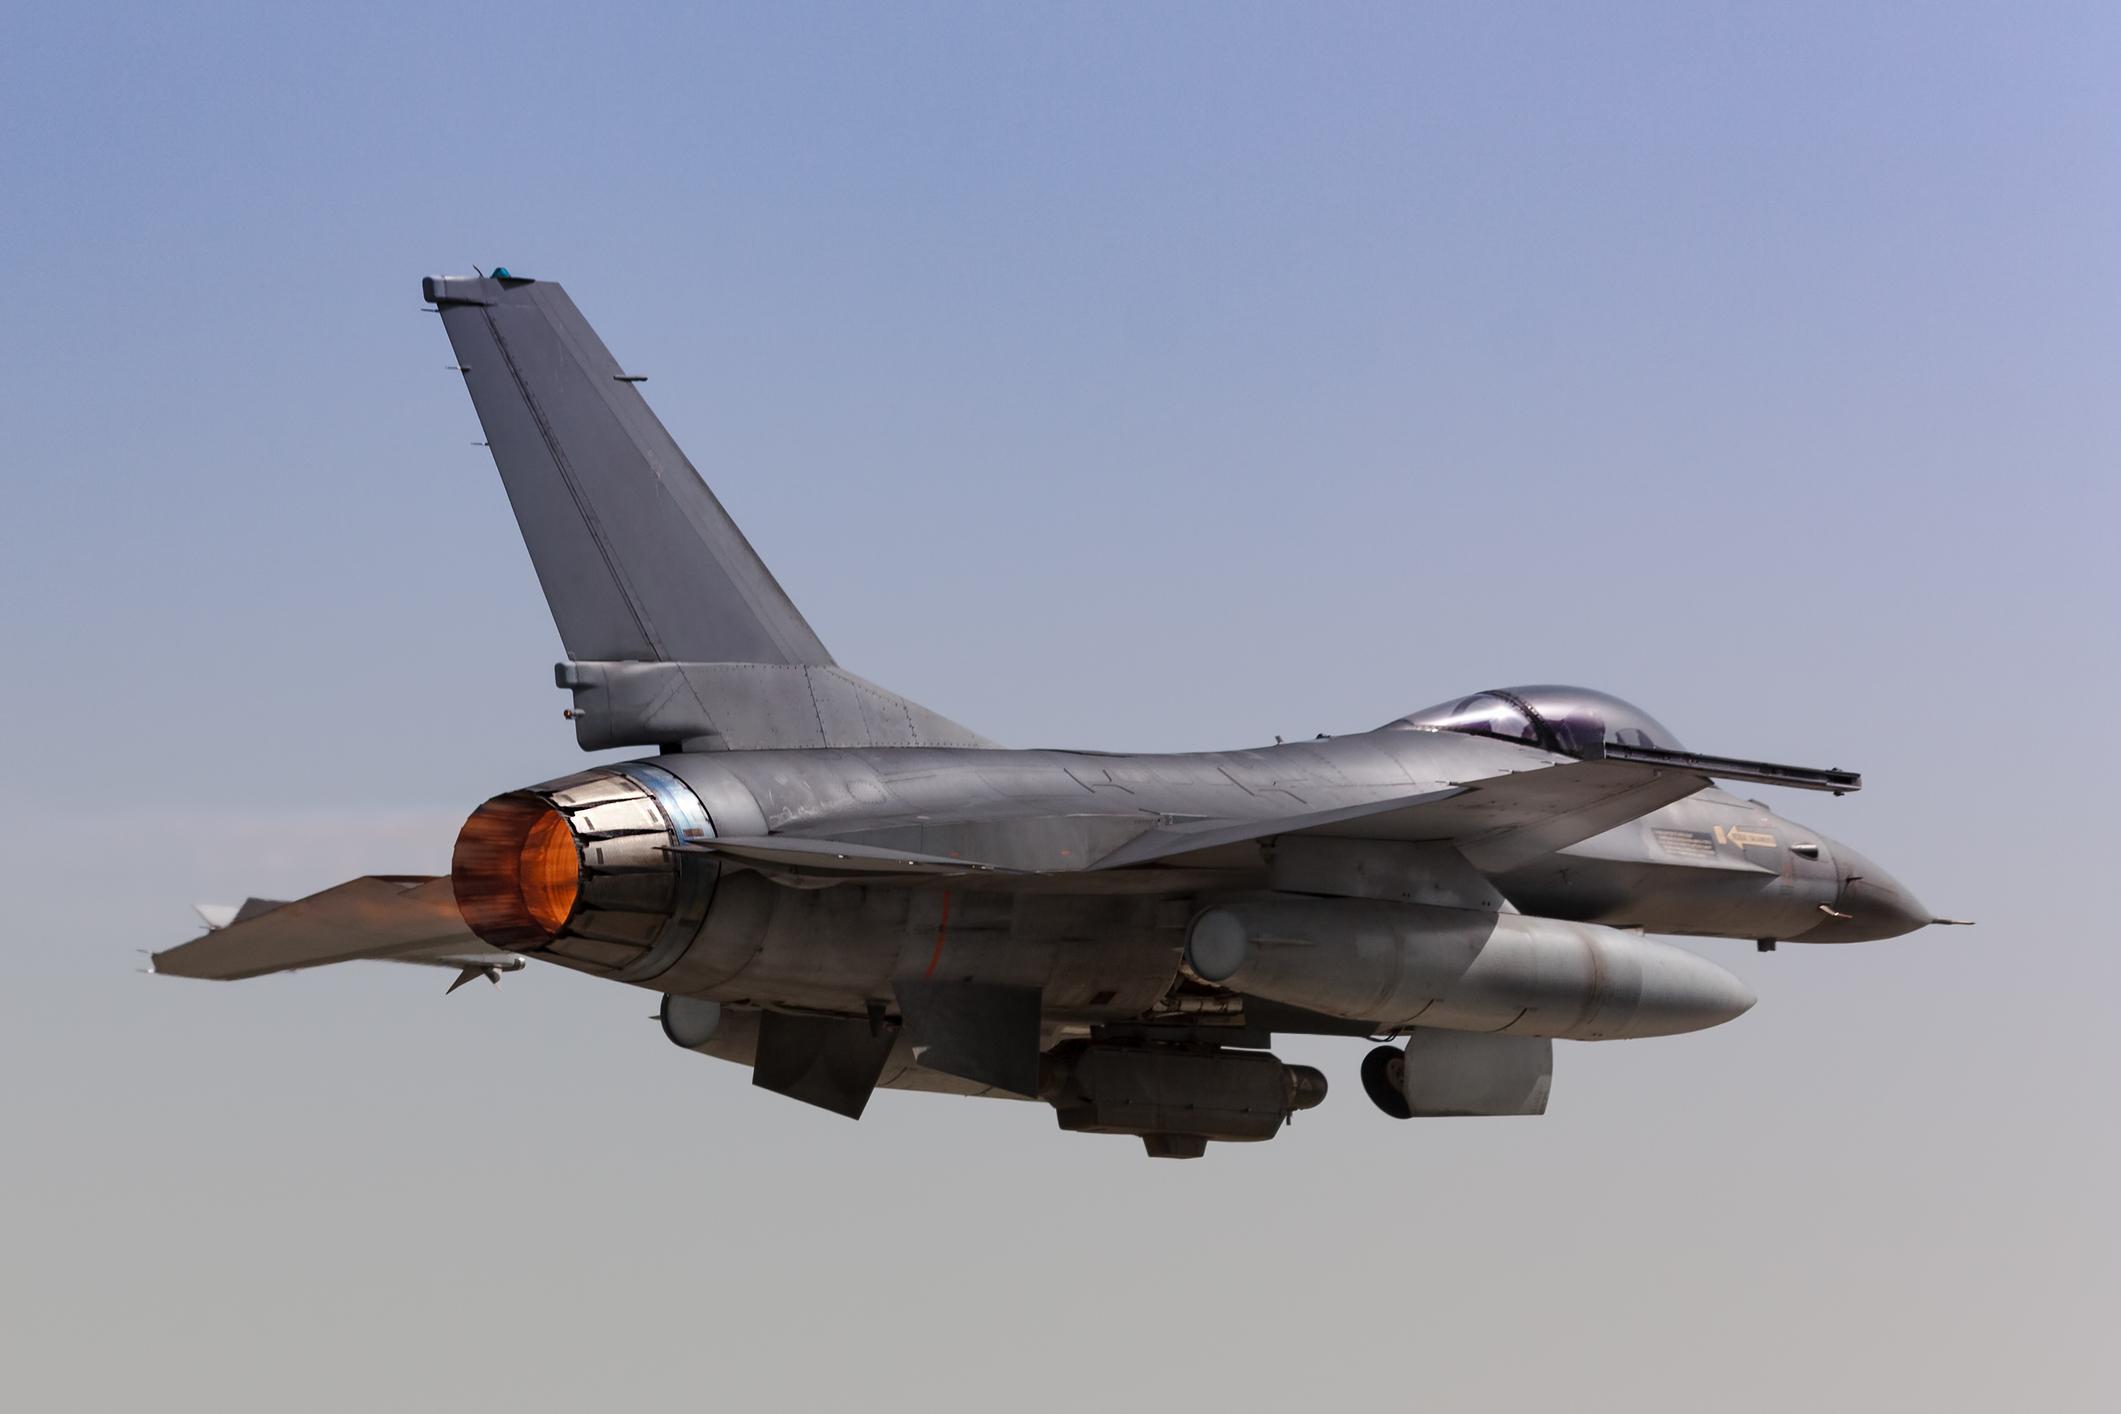 a F-16 Fighting Falcon in flight.